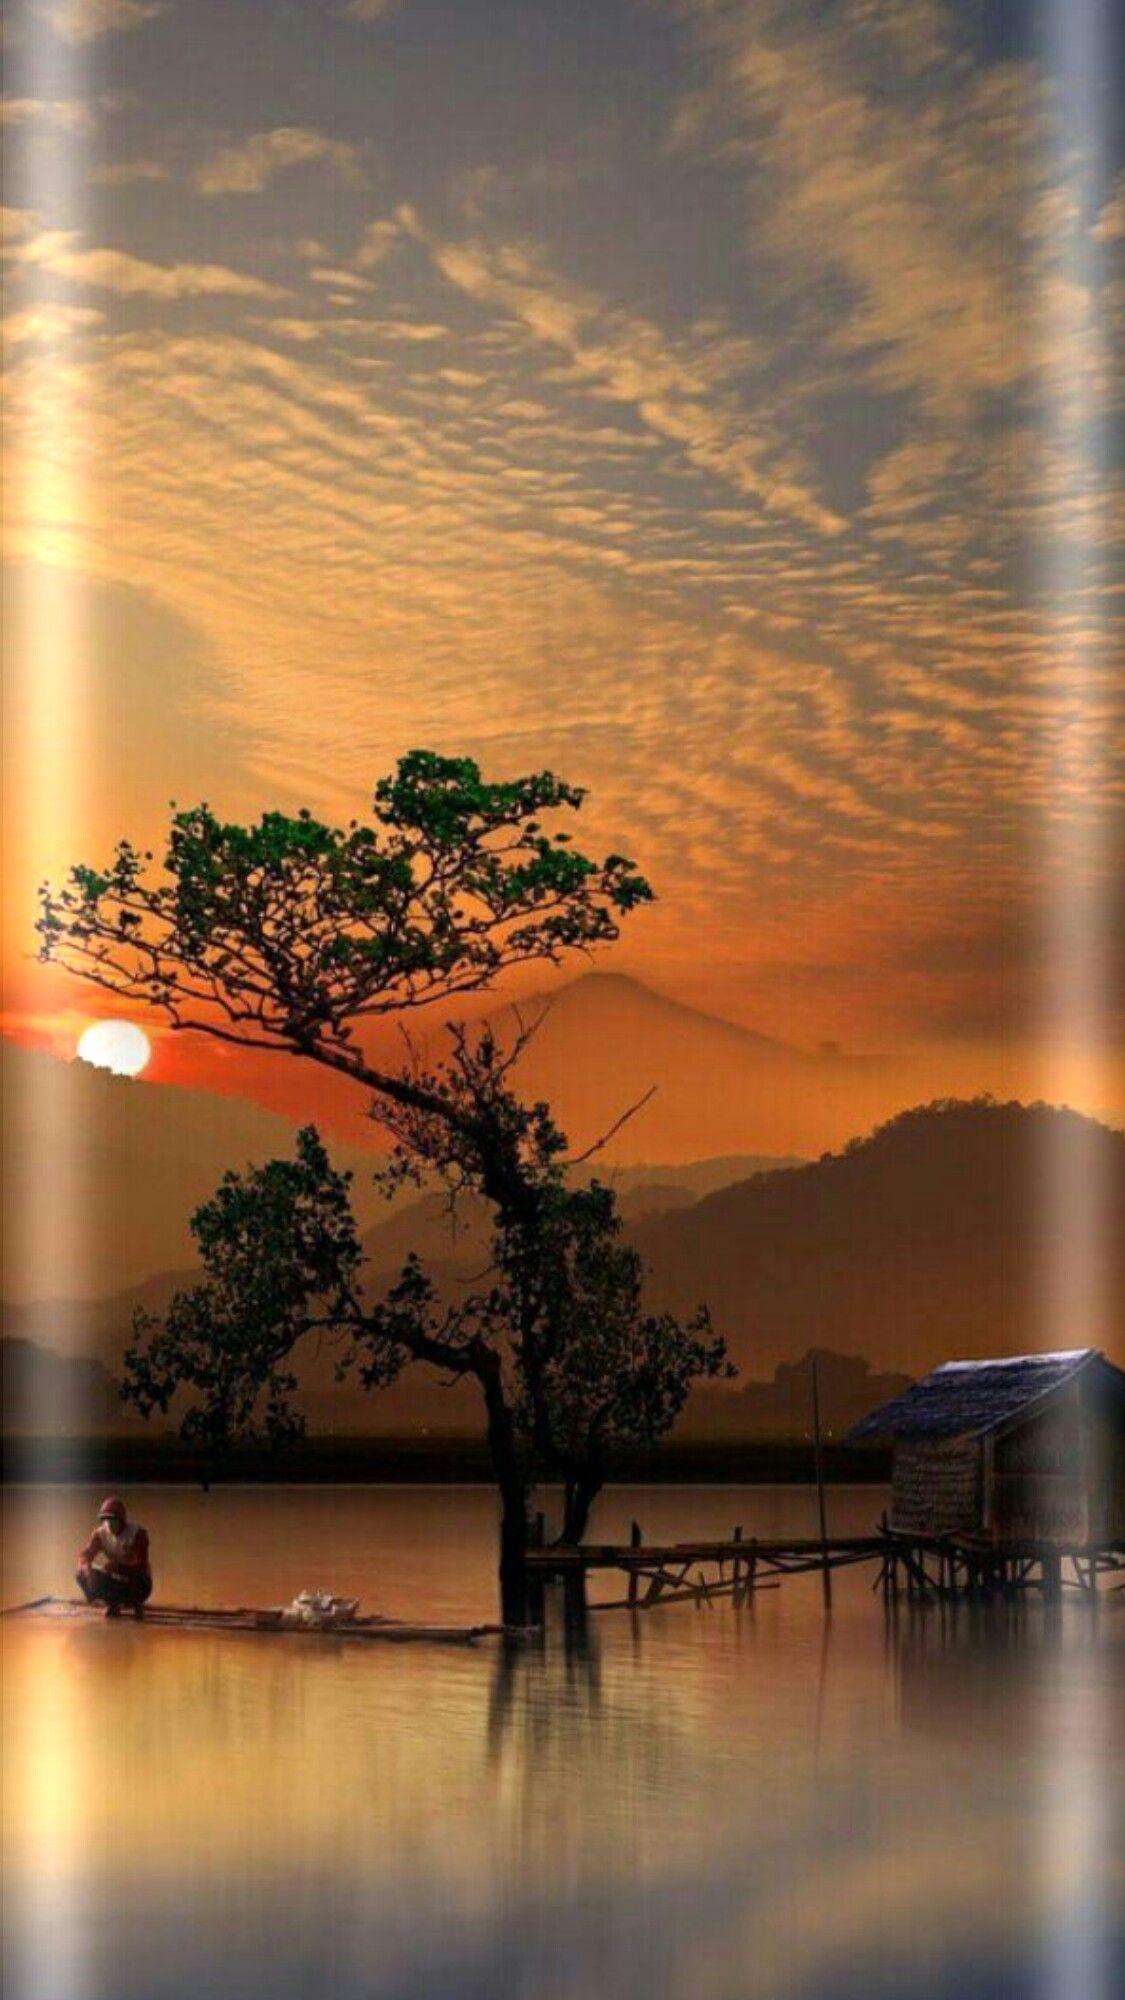 Samsung Iphone Edge Phonetelefon Hd Wallpaper Beautiful Landscapes Nature Photography Nature